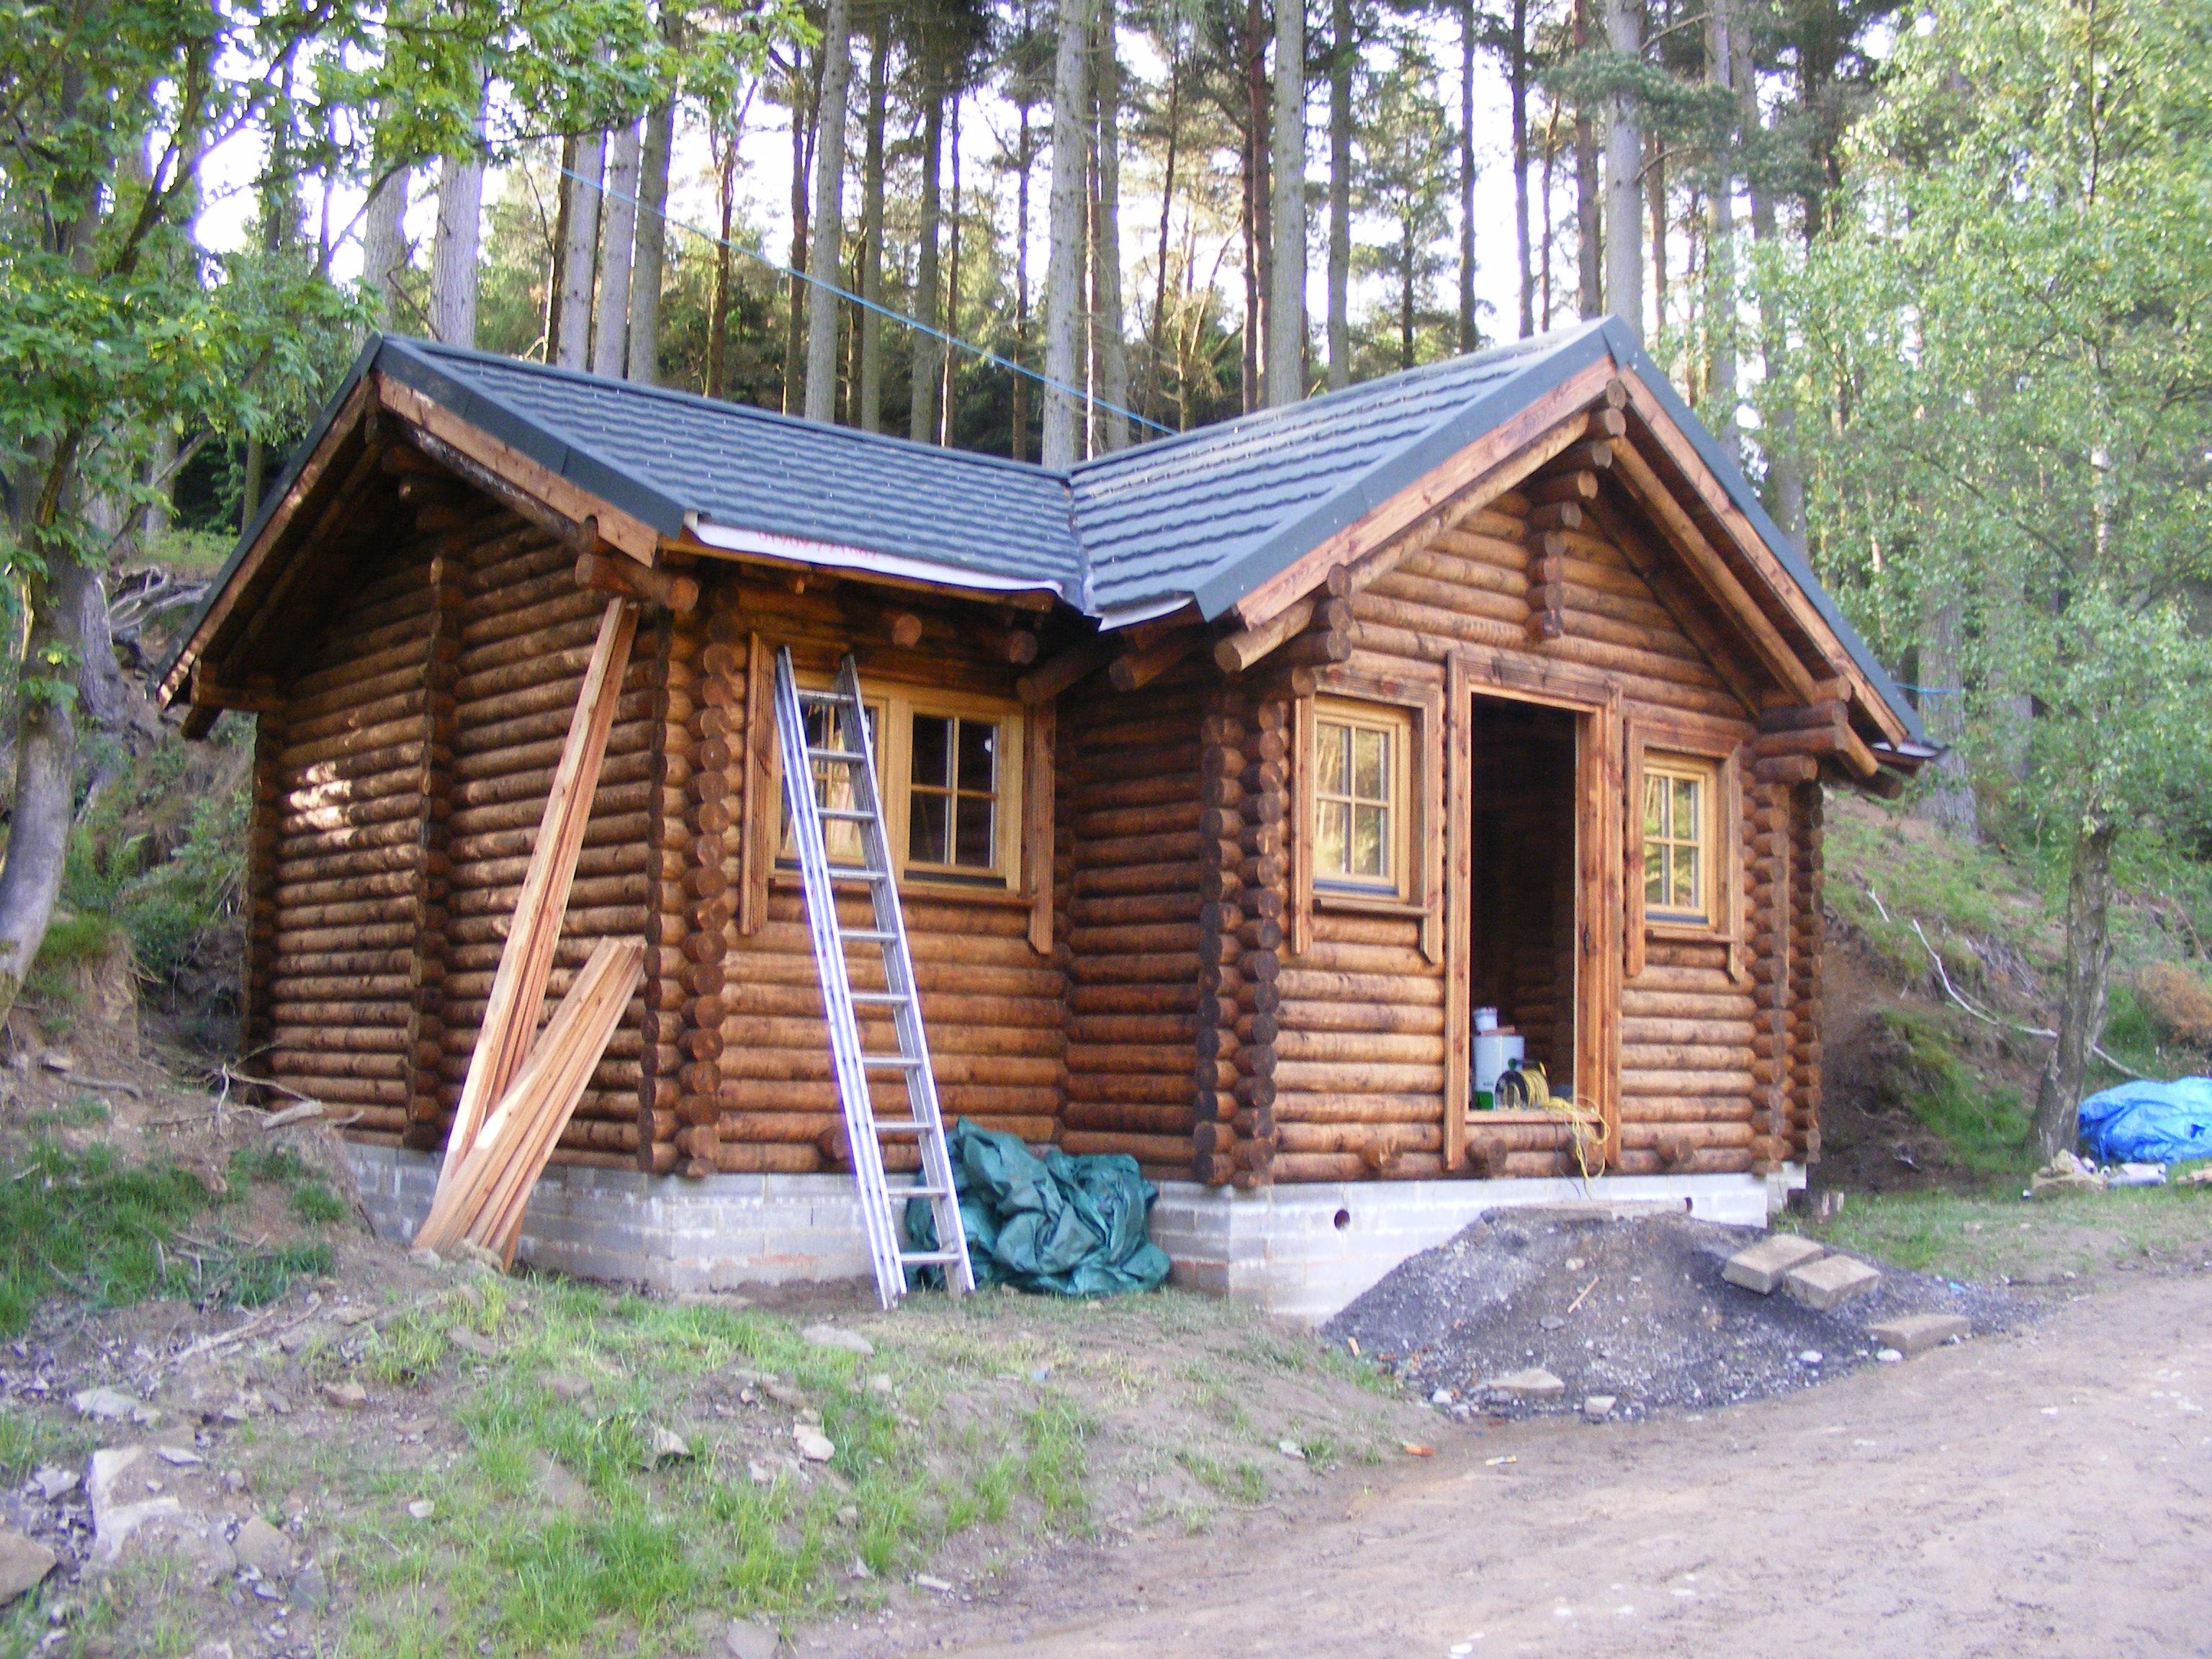 Log builder scotland log cabin scotland log home scotland for Log cabins for sale north yorkshire